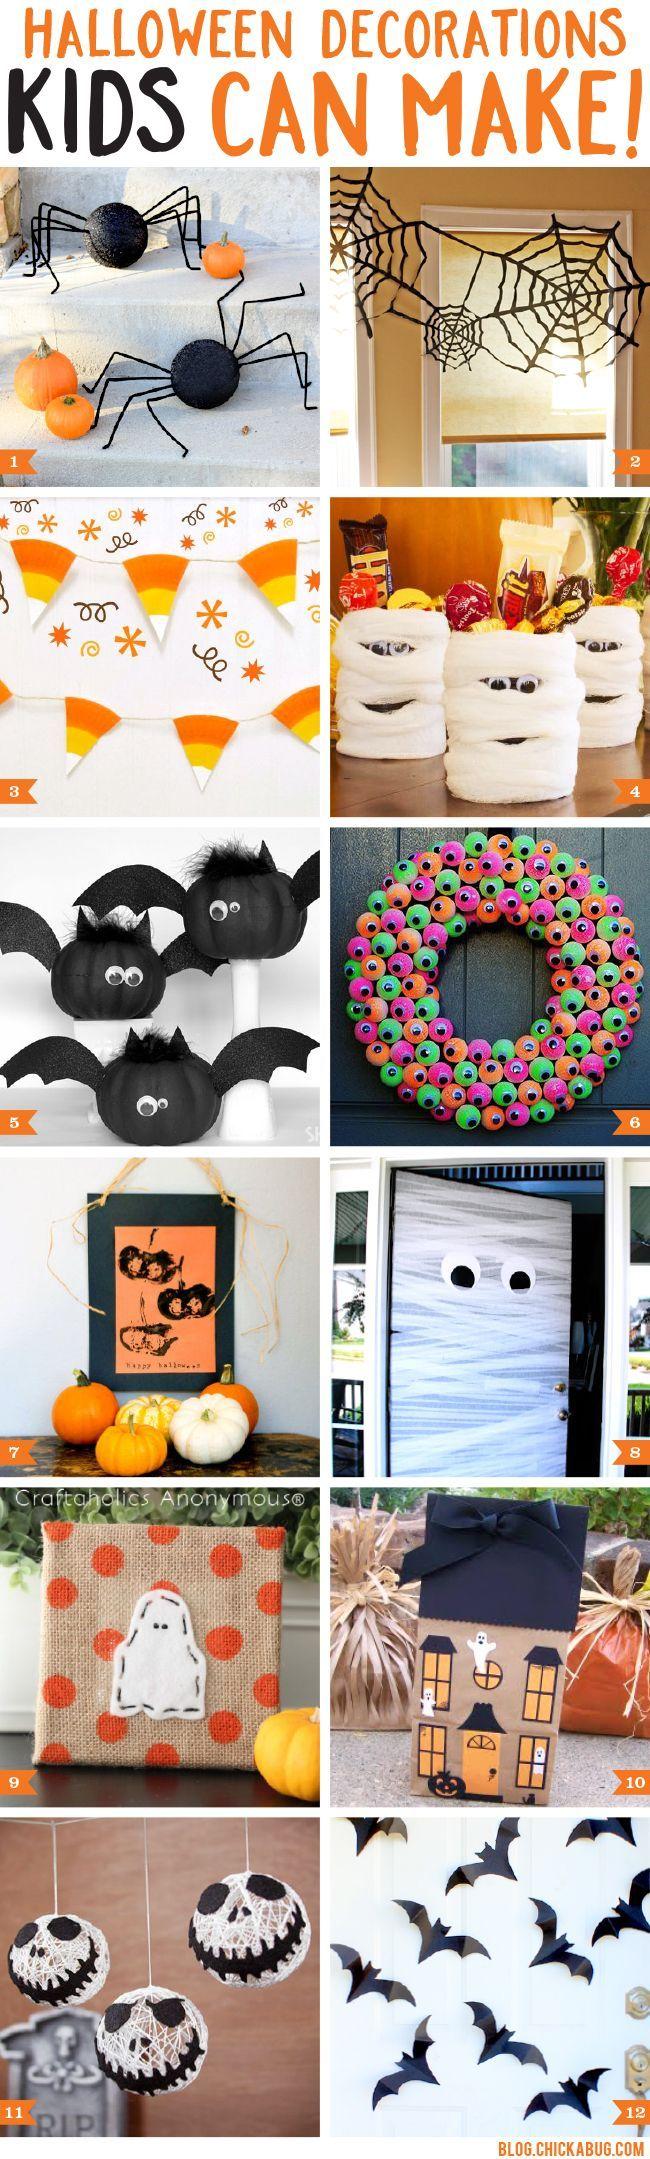 Halloween Decorations Kids Can Make Chickabug Halloween Decorations For Kids Halloween Party Kids Halloween Kids